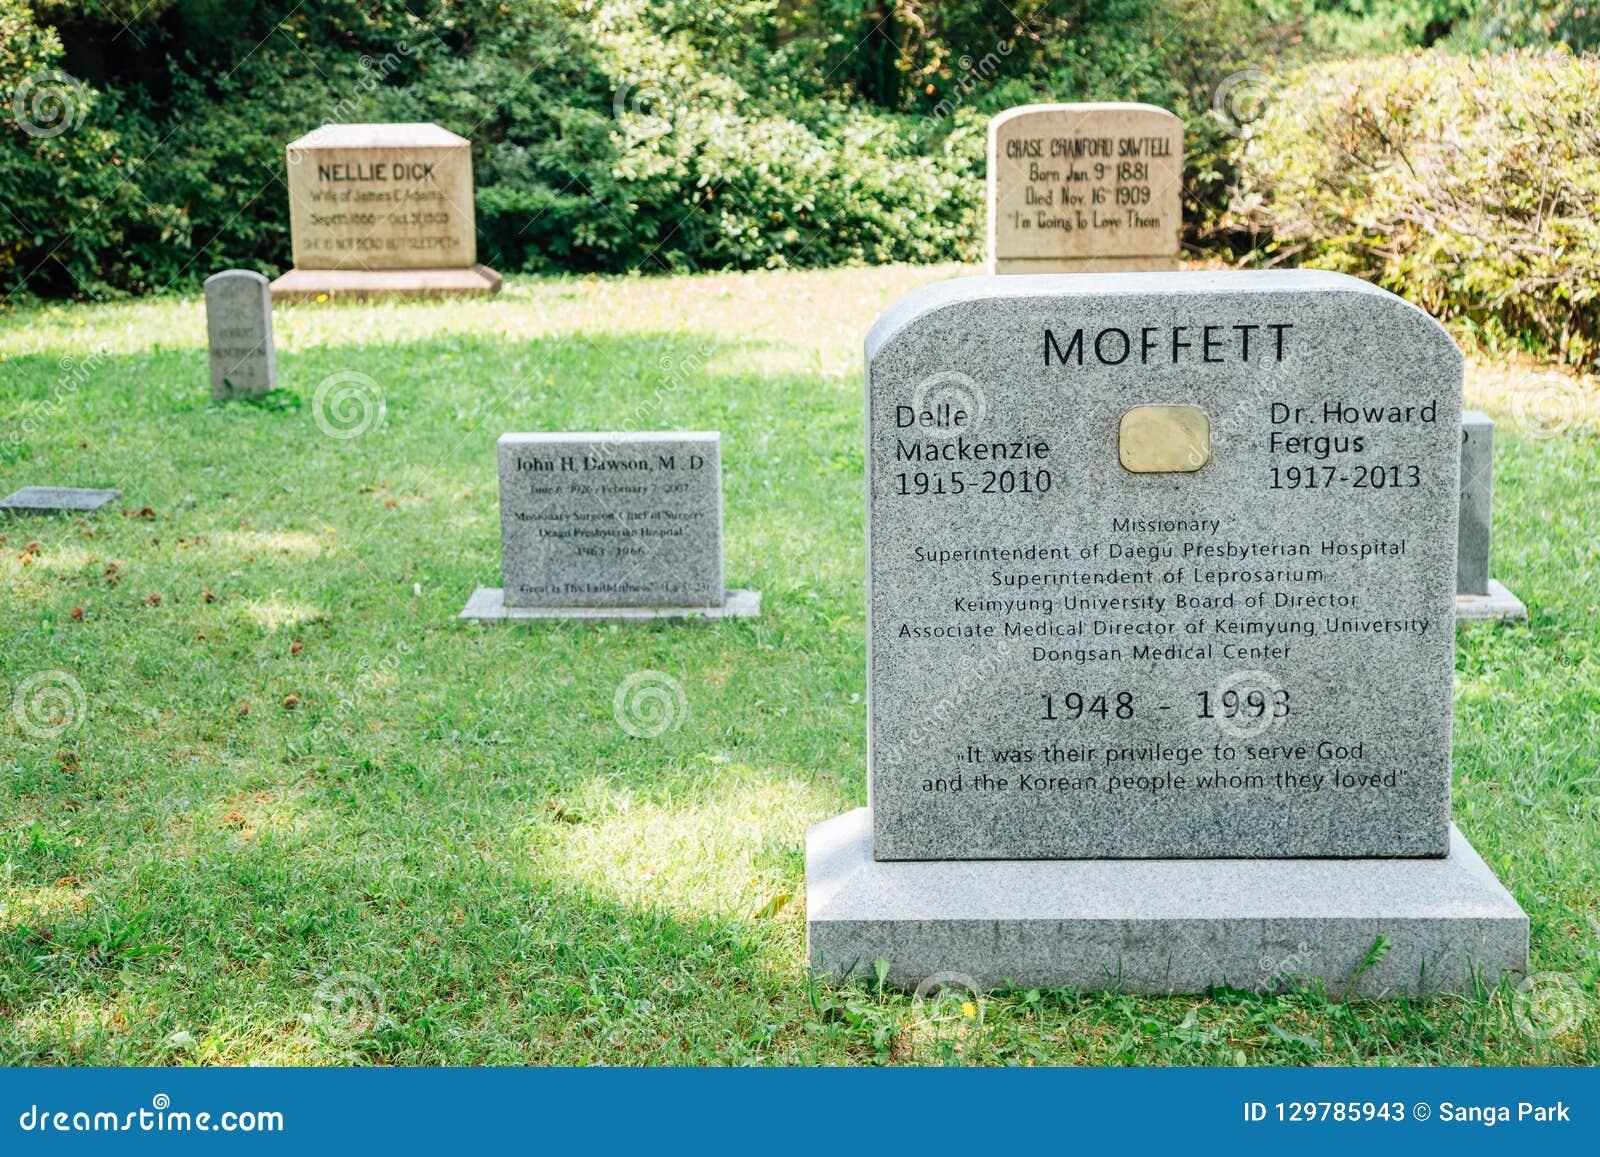 Tombstones at Cheongna hill cemetery in Daegu, Korea